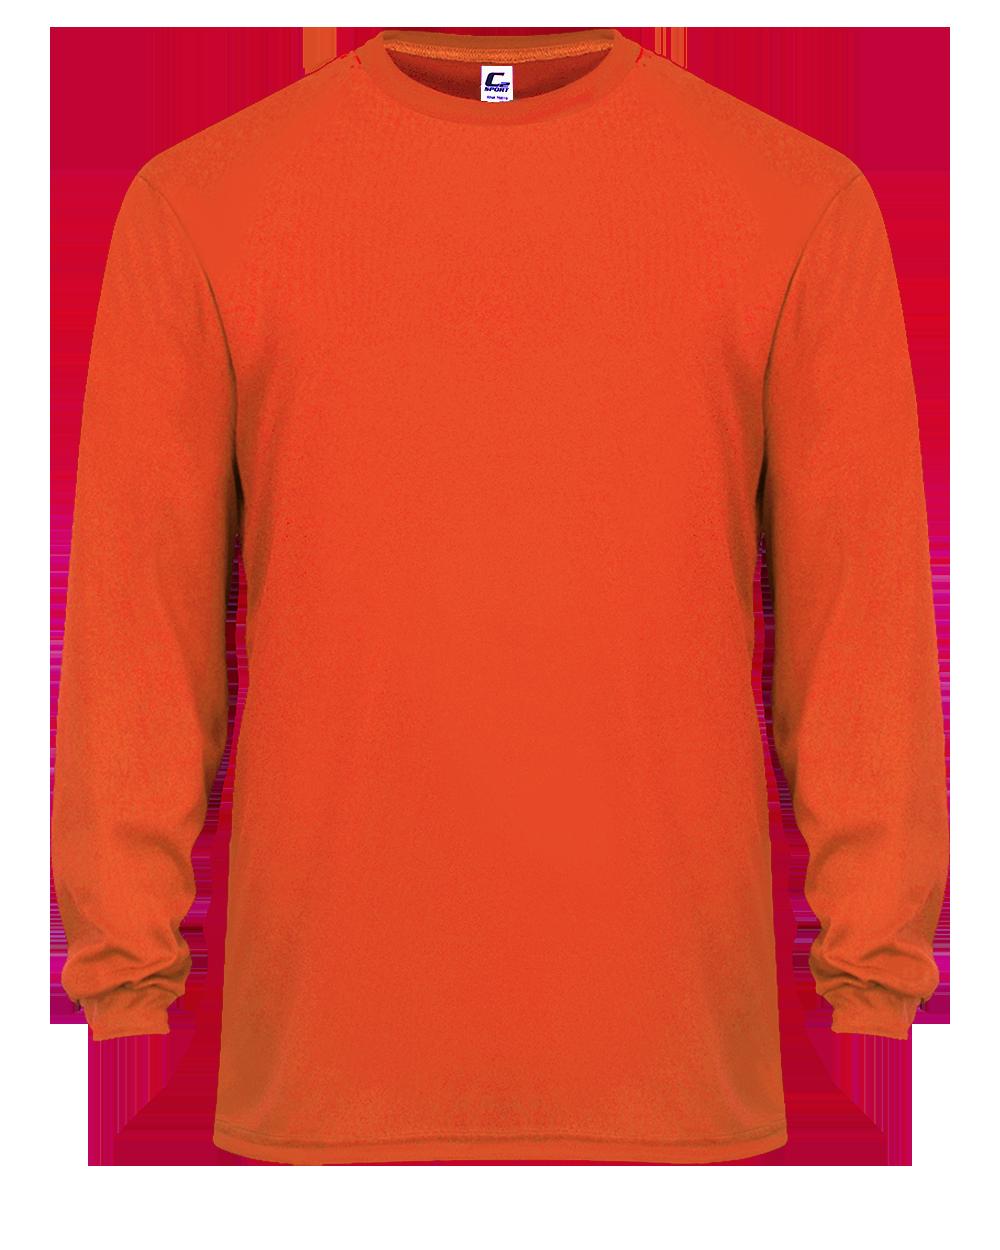 C2 L/S Tee - Burnt Orange (005104BO)